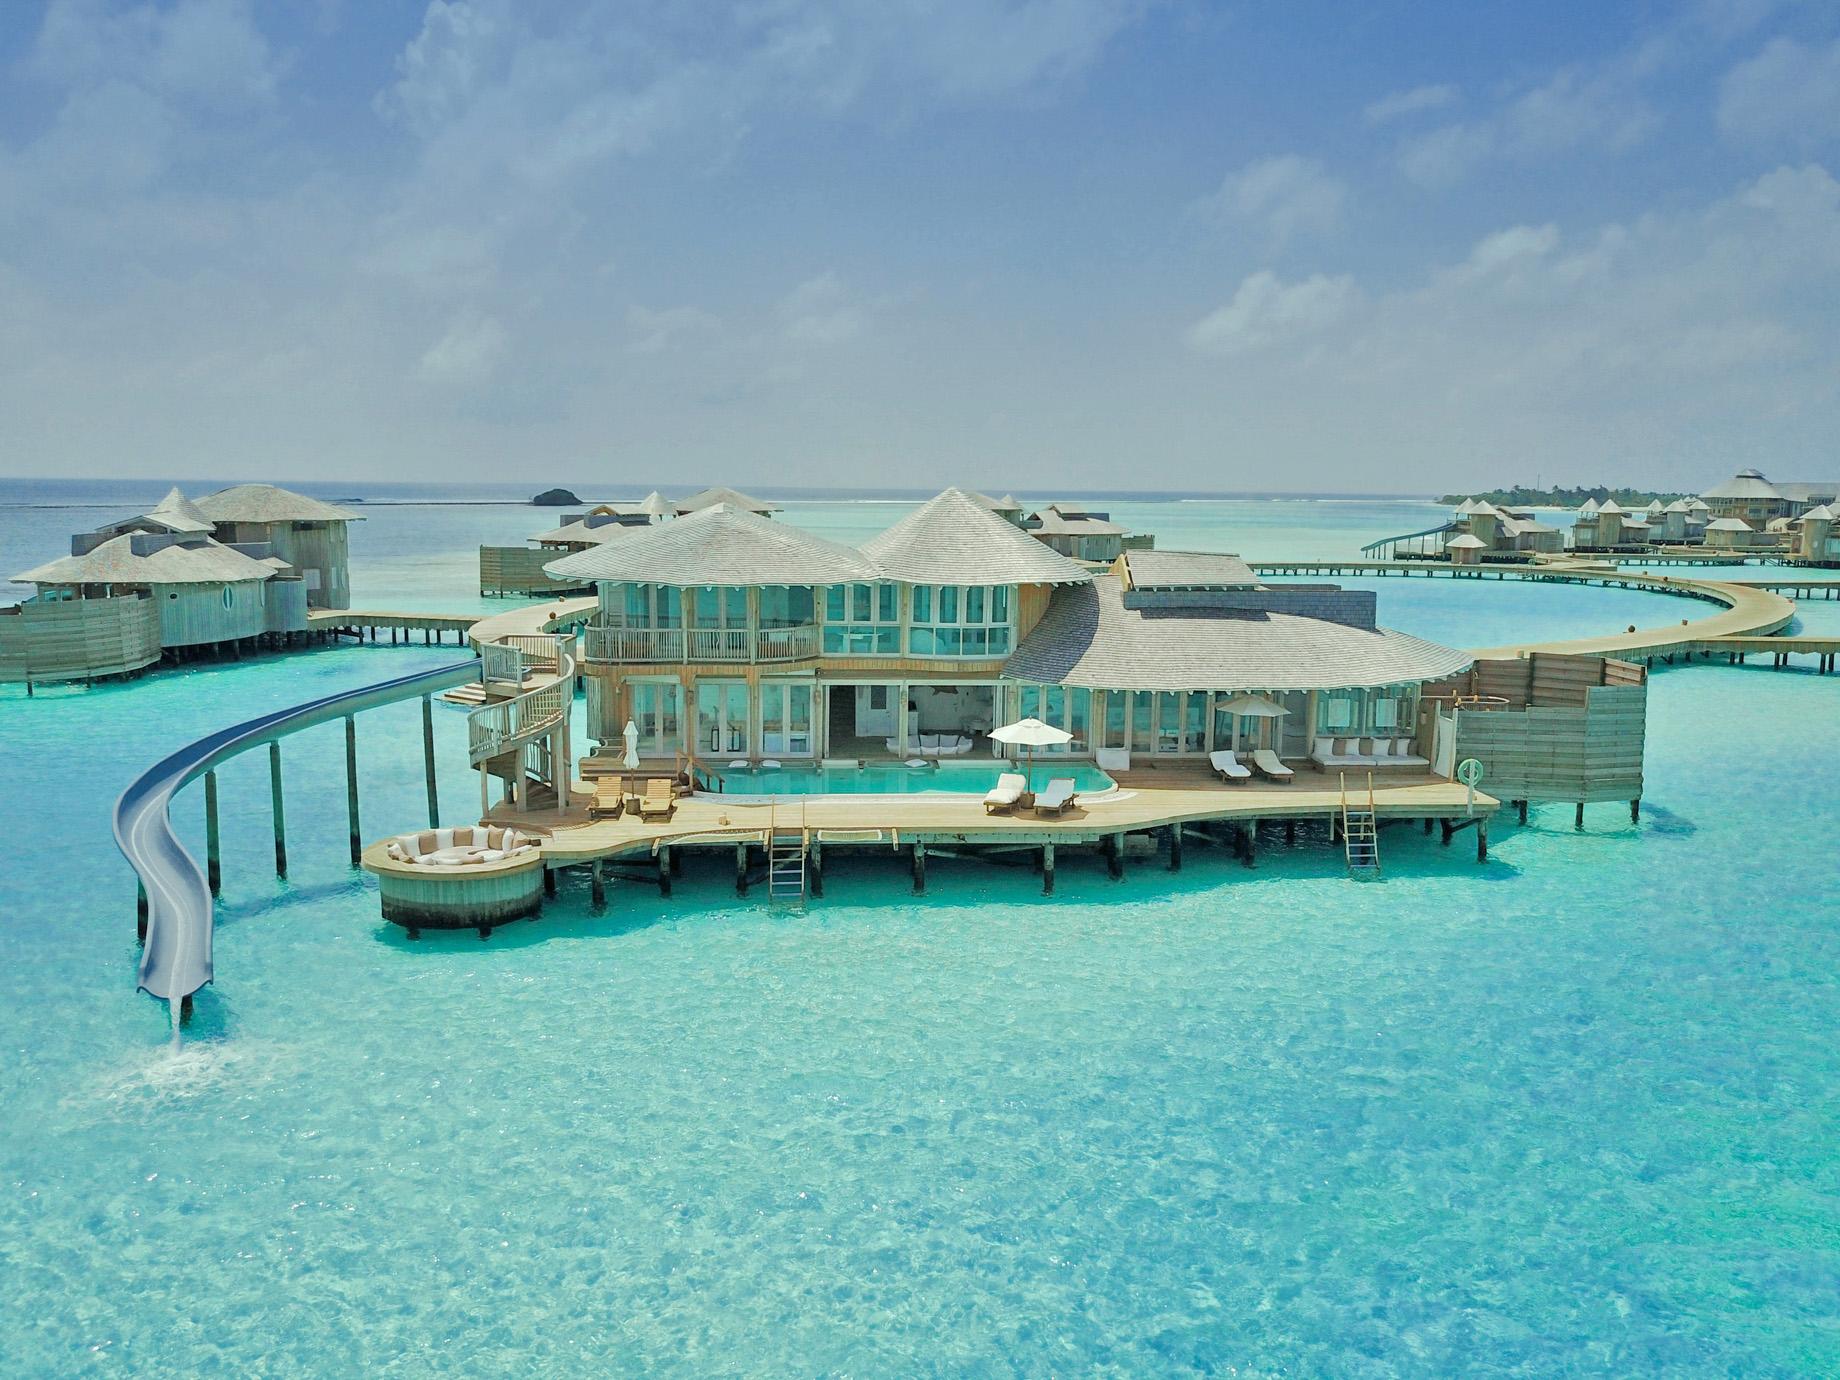 Soneva Jani Luxury Resort – Noonu Atoll, Medhufaru, Maldives – 3 Bedroom Water Reserve Villa with Slide Aerial